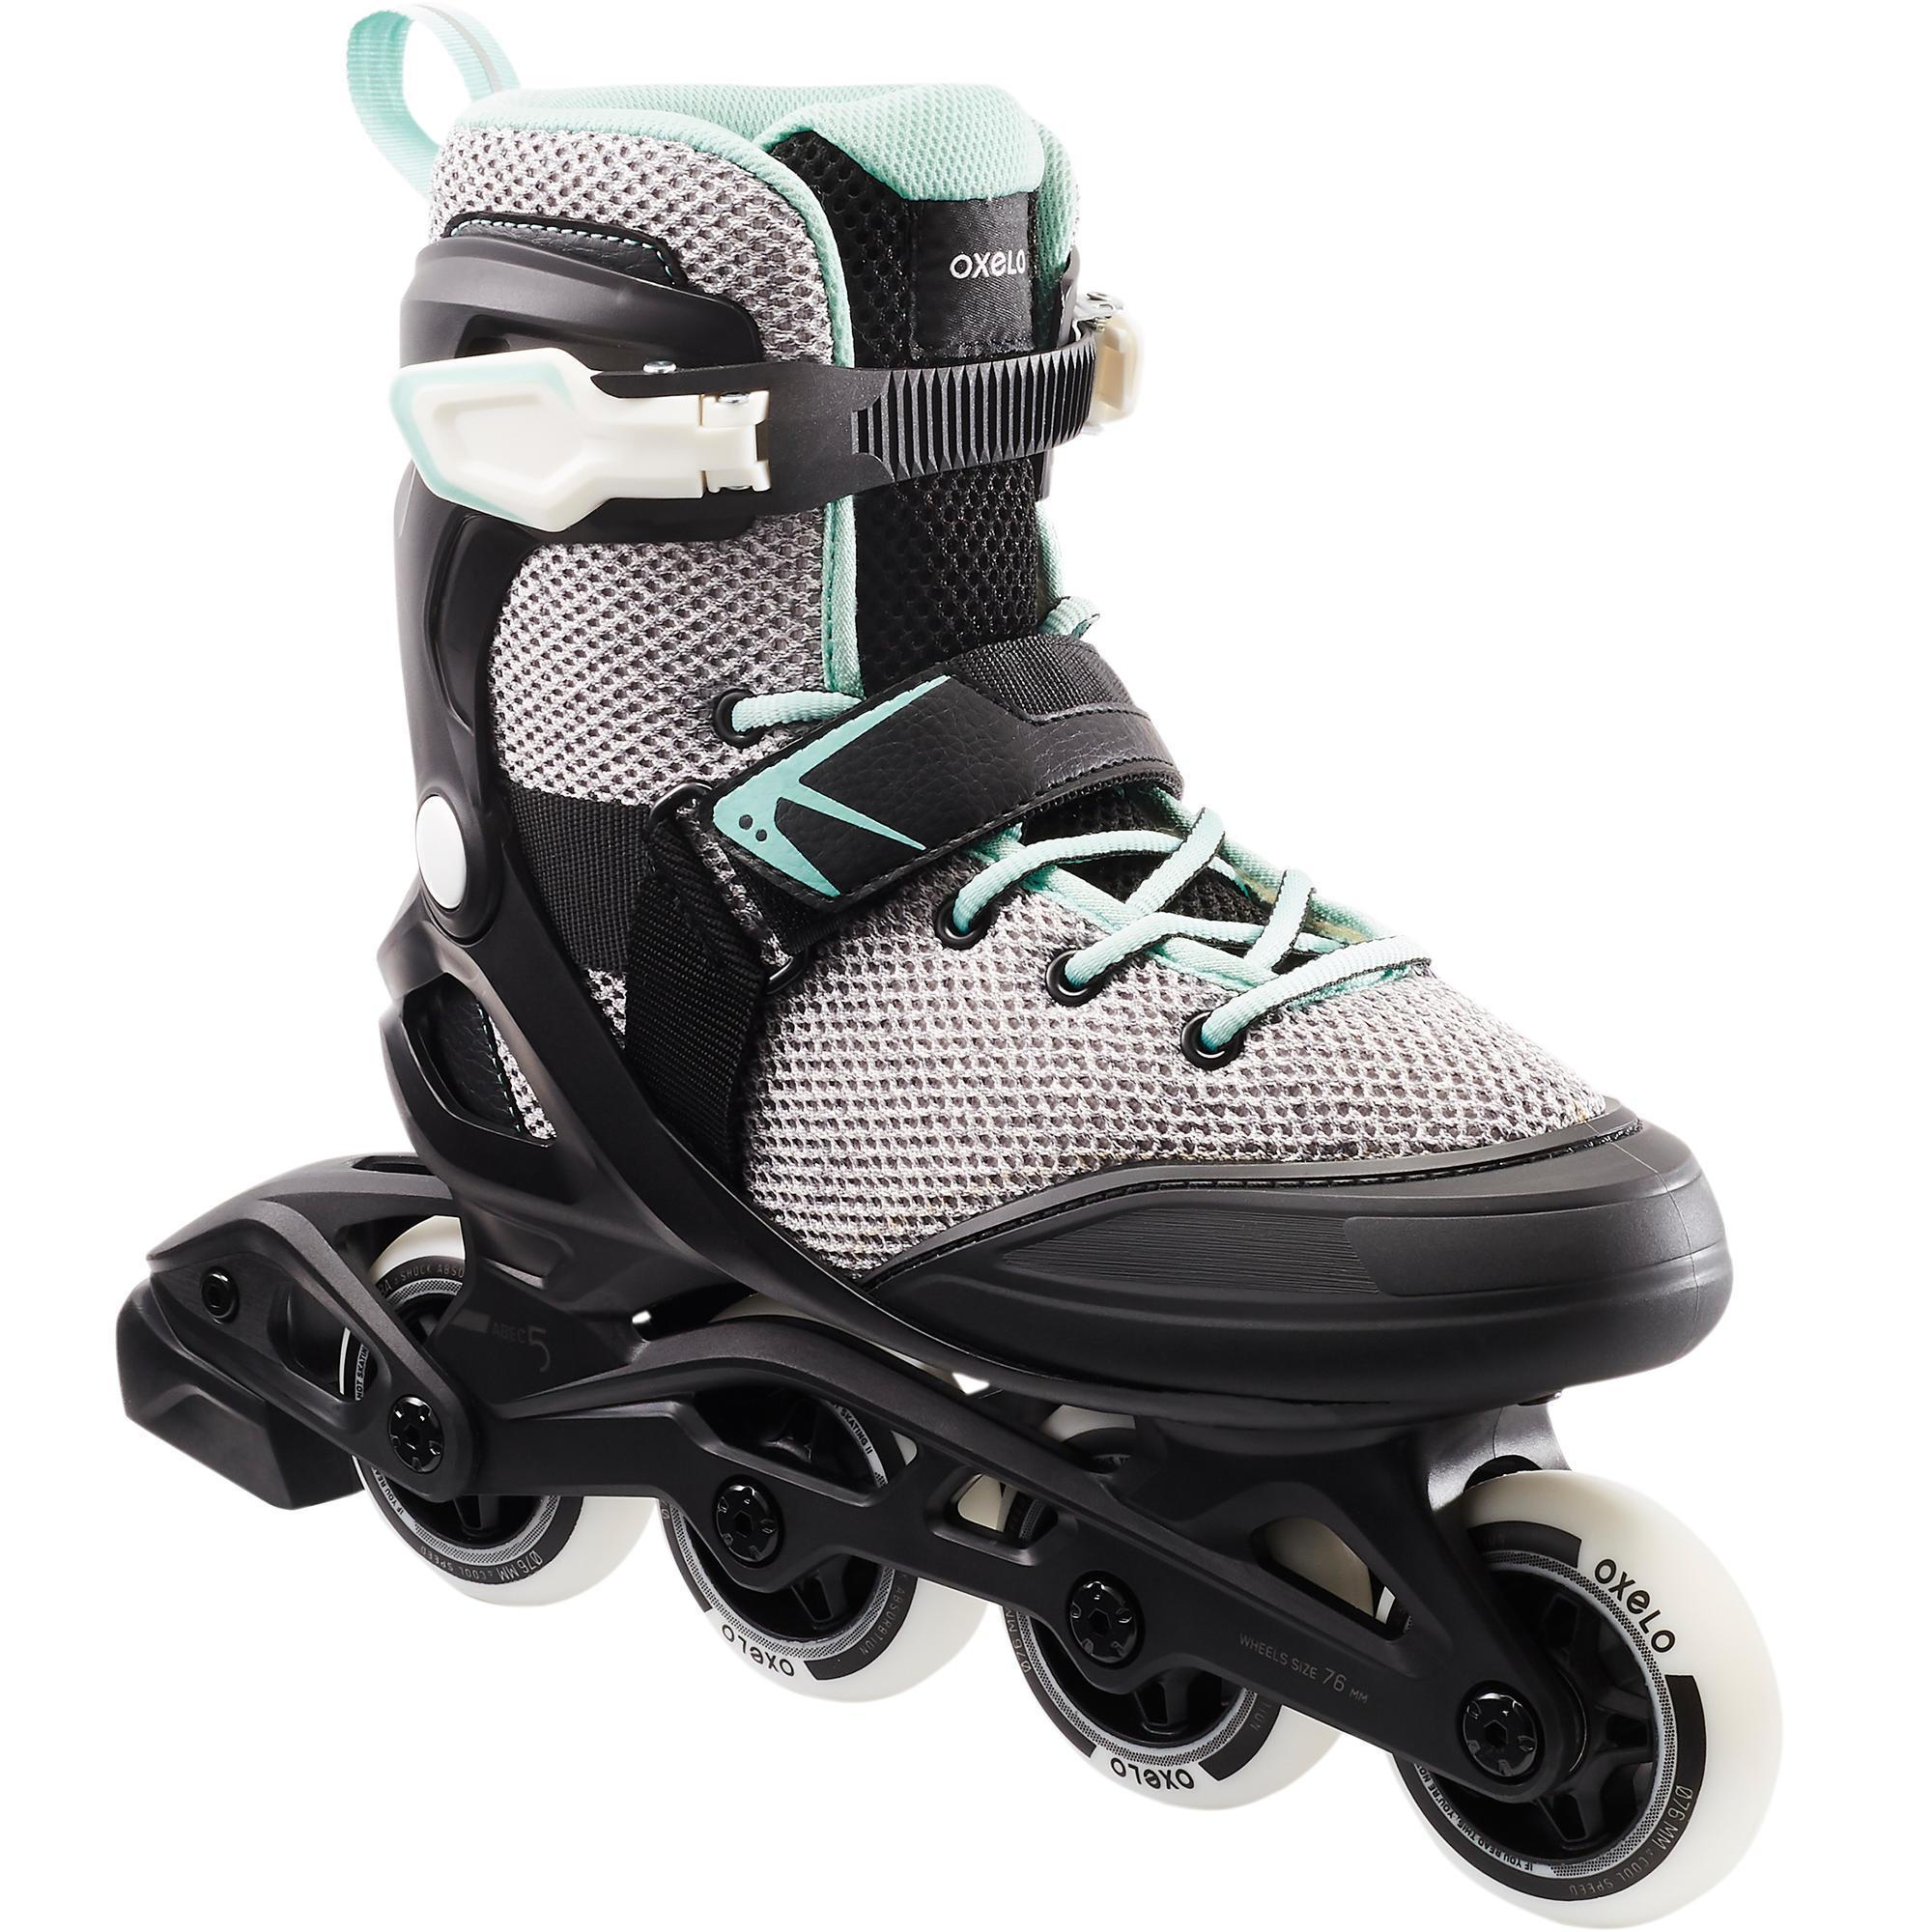 40e7398722e Inline Skates und Rollschuhe | günstig | Oxelo | DECATHLON